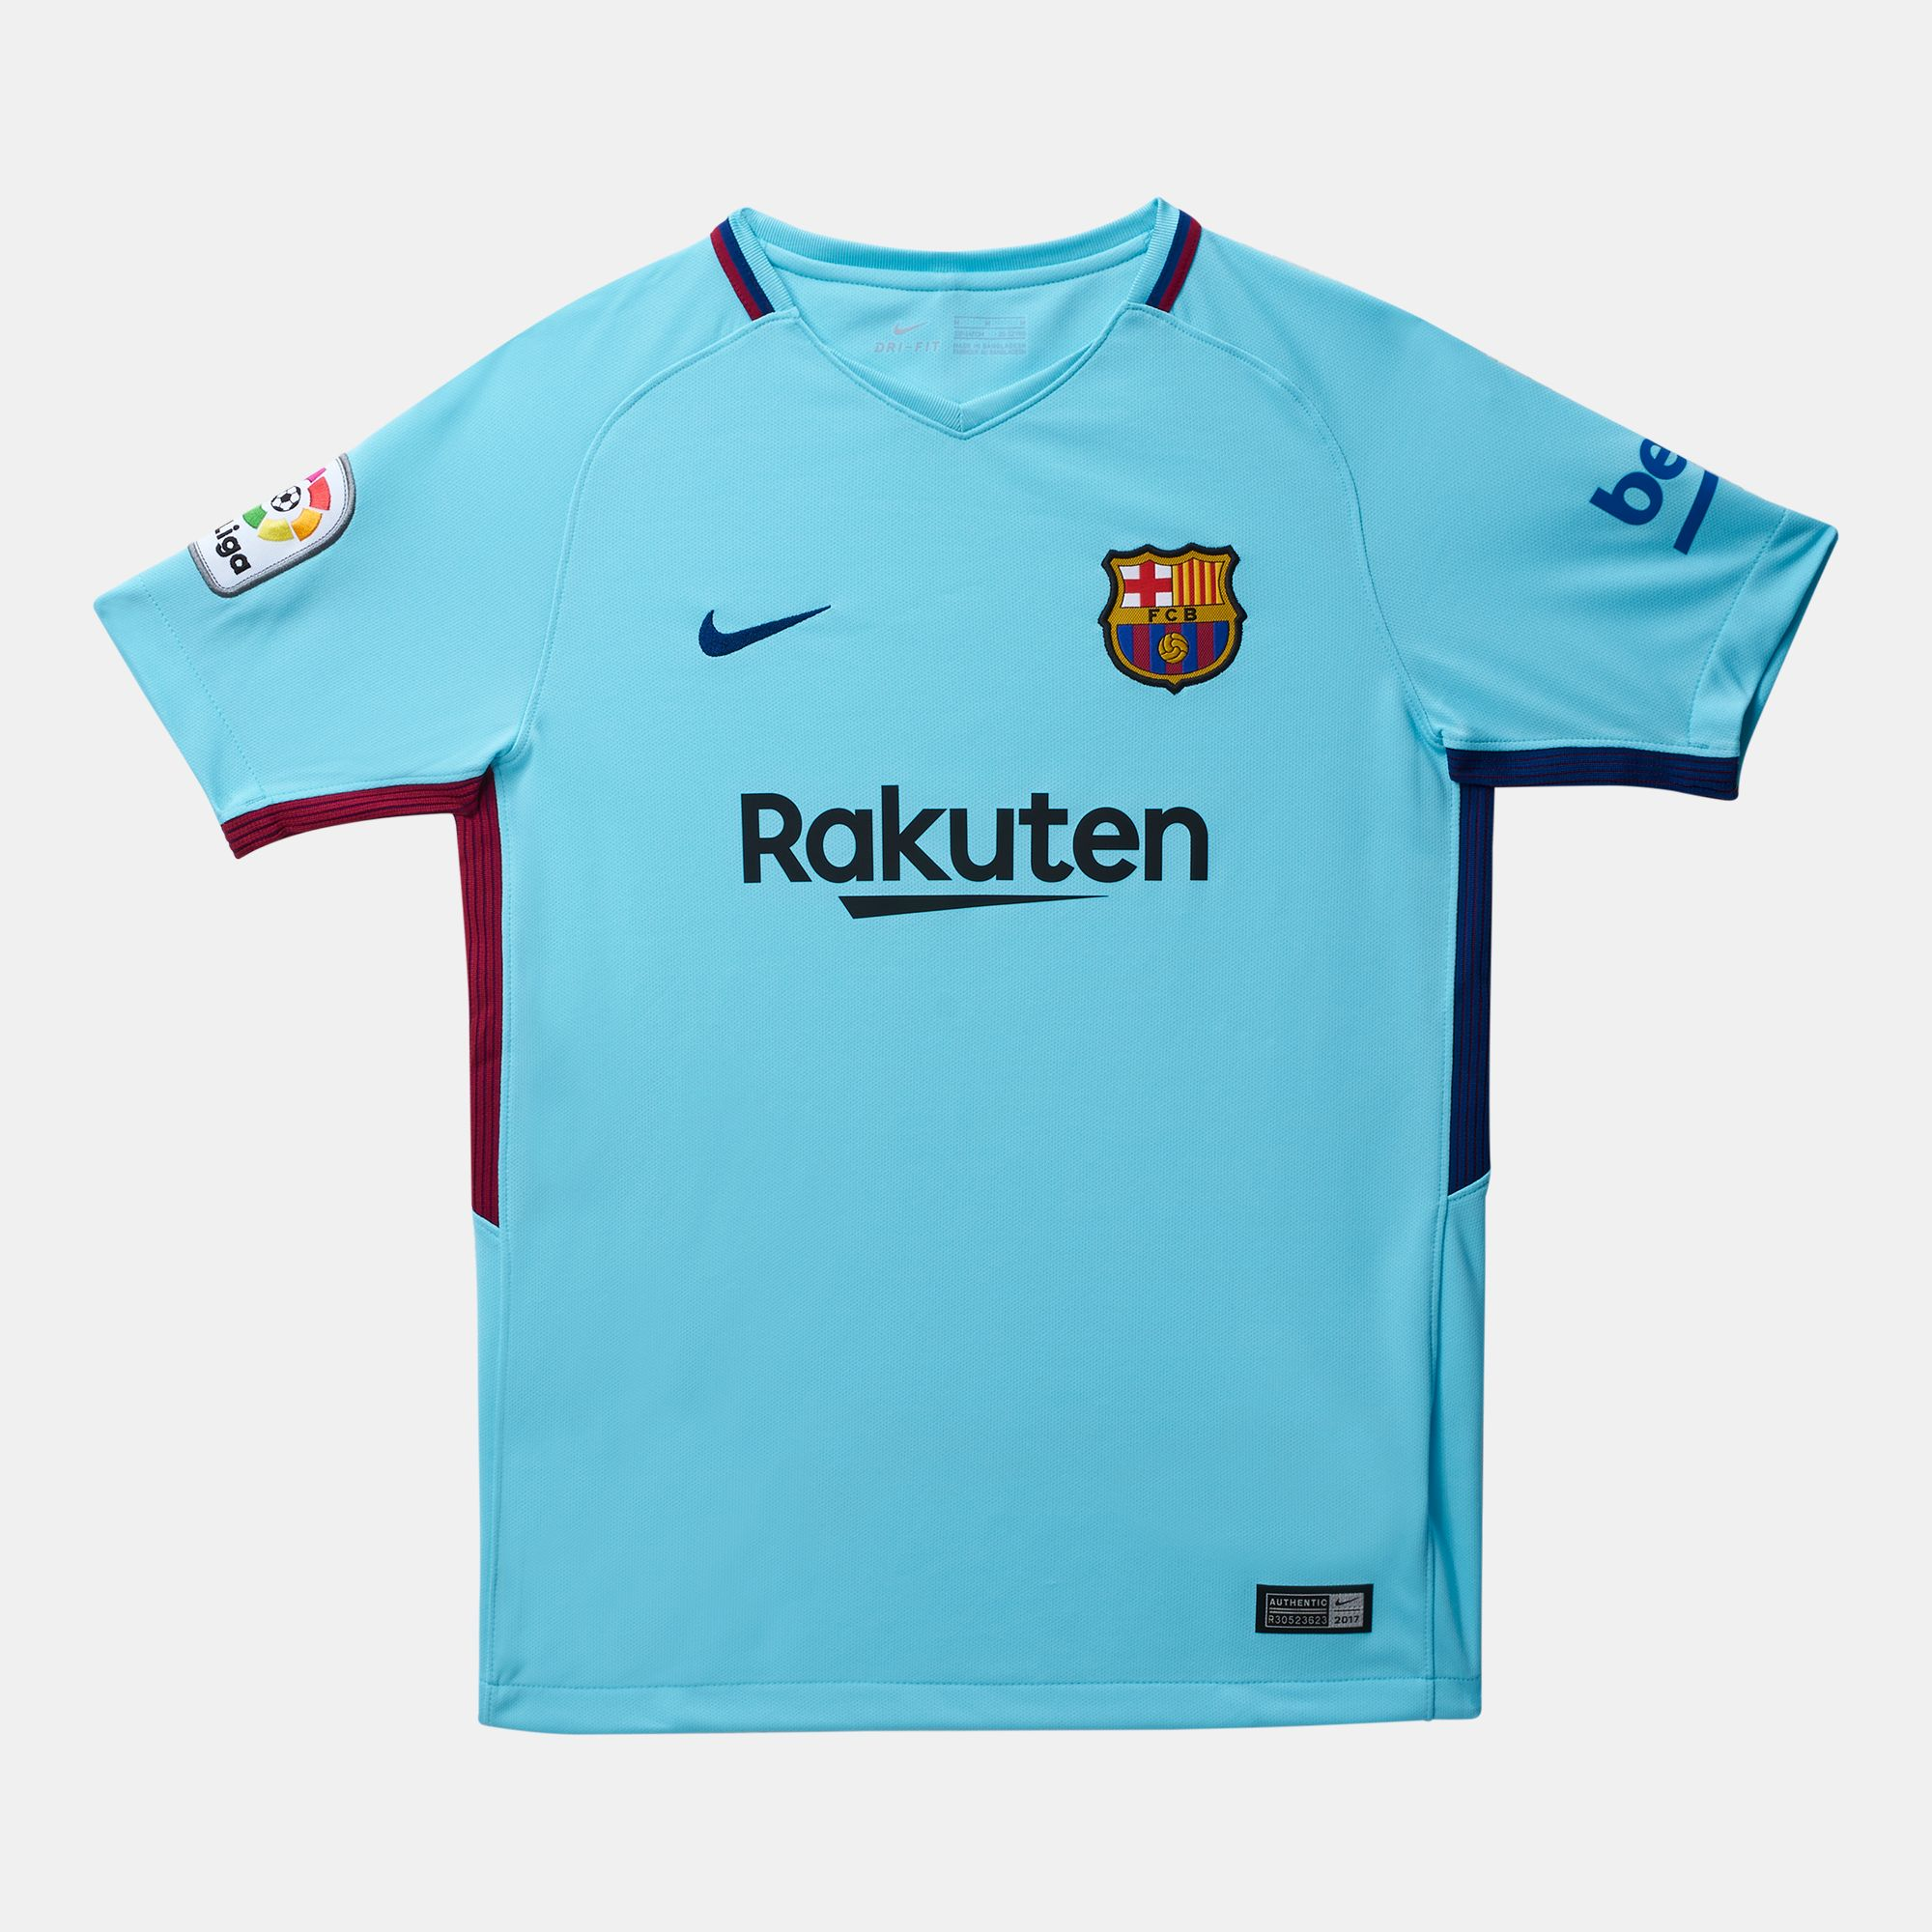 02bf37bede9 Shop Blue Nike Kids' FC Barcelona Stadium Away T-Shirt - 2017/2018 ...